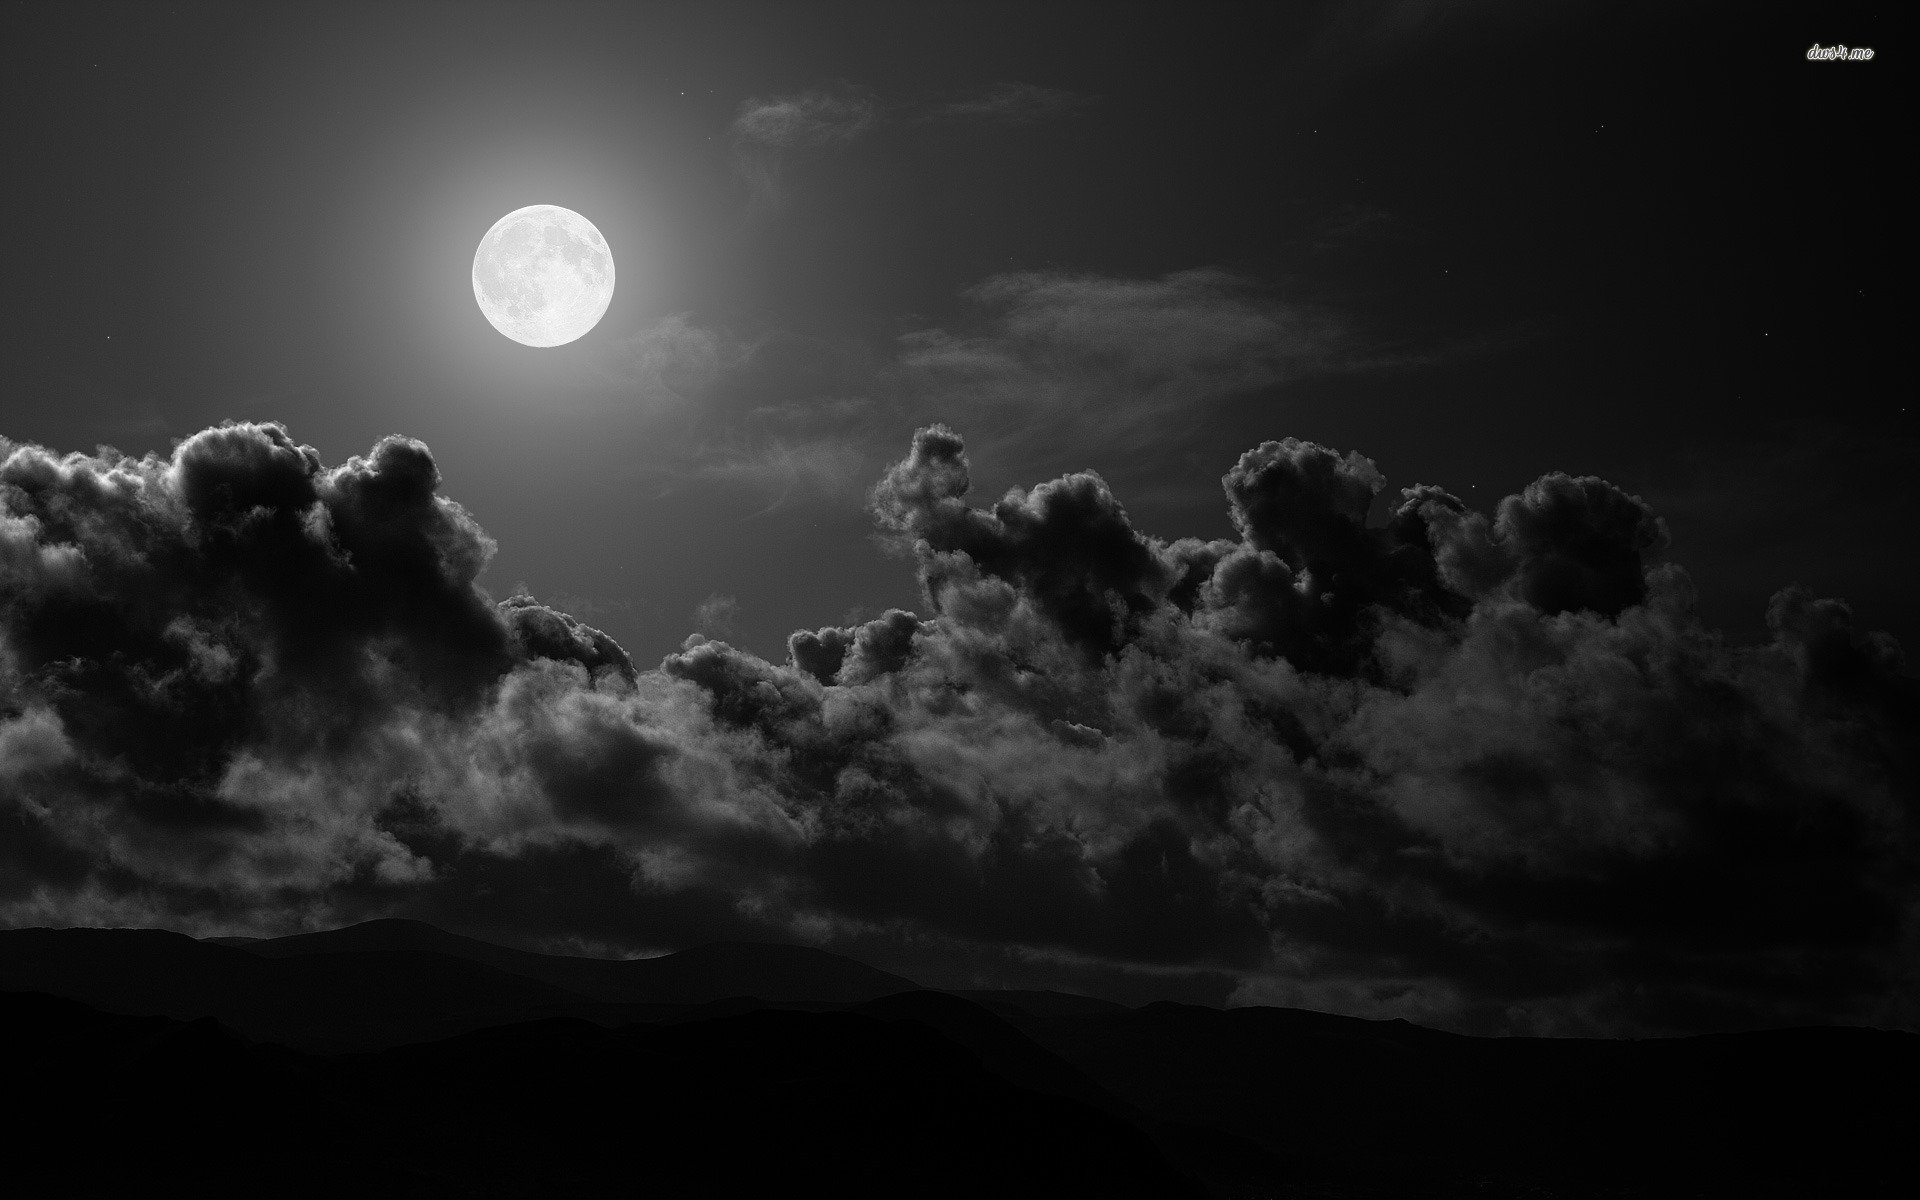 moon-cloud-sky-night-mountain.jpg